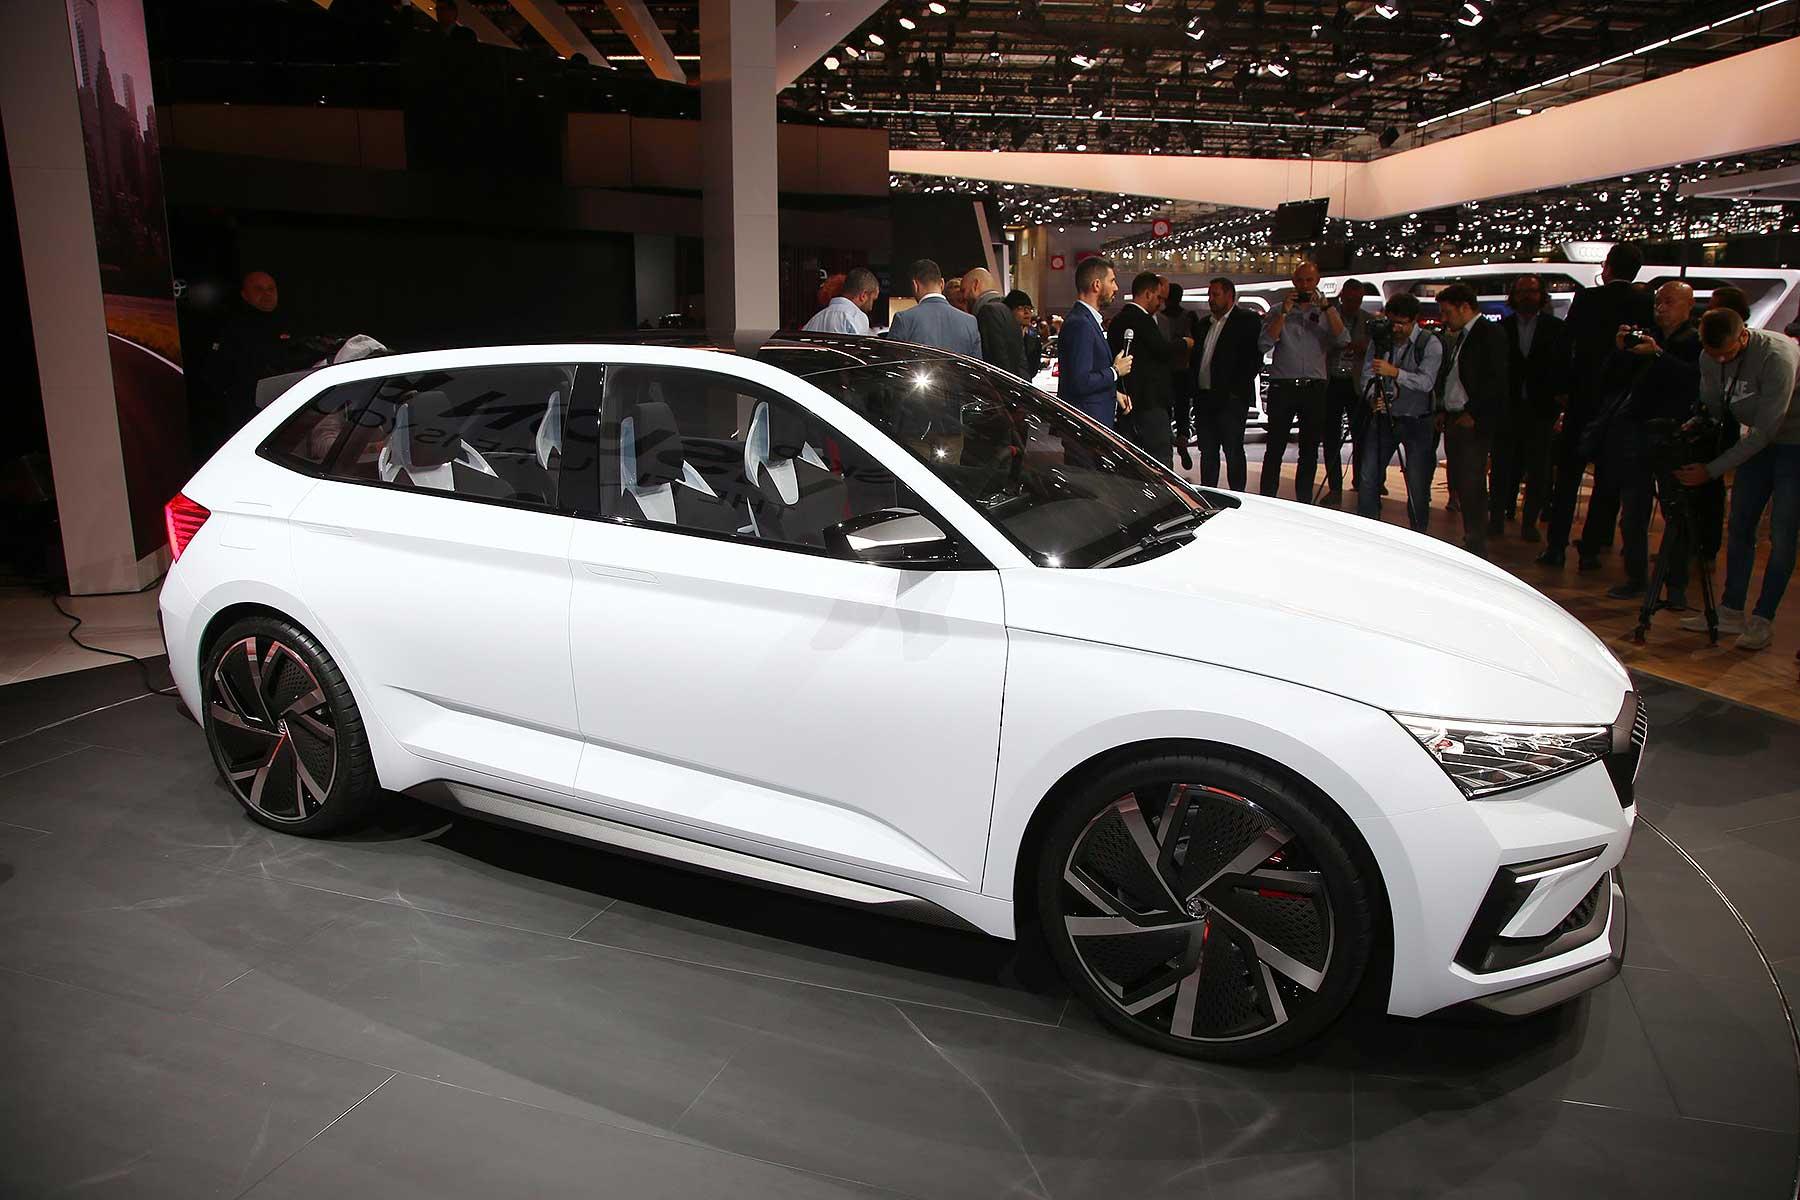 Skoda Scala Name Confirmed For Czech Volkswagen Golf Motoring Research